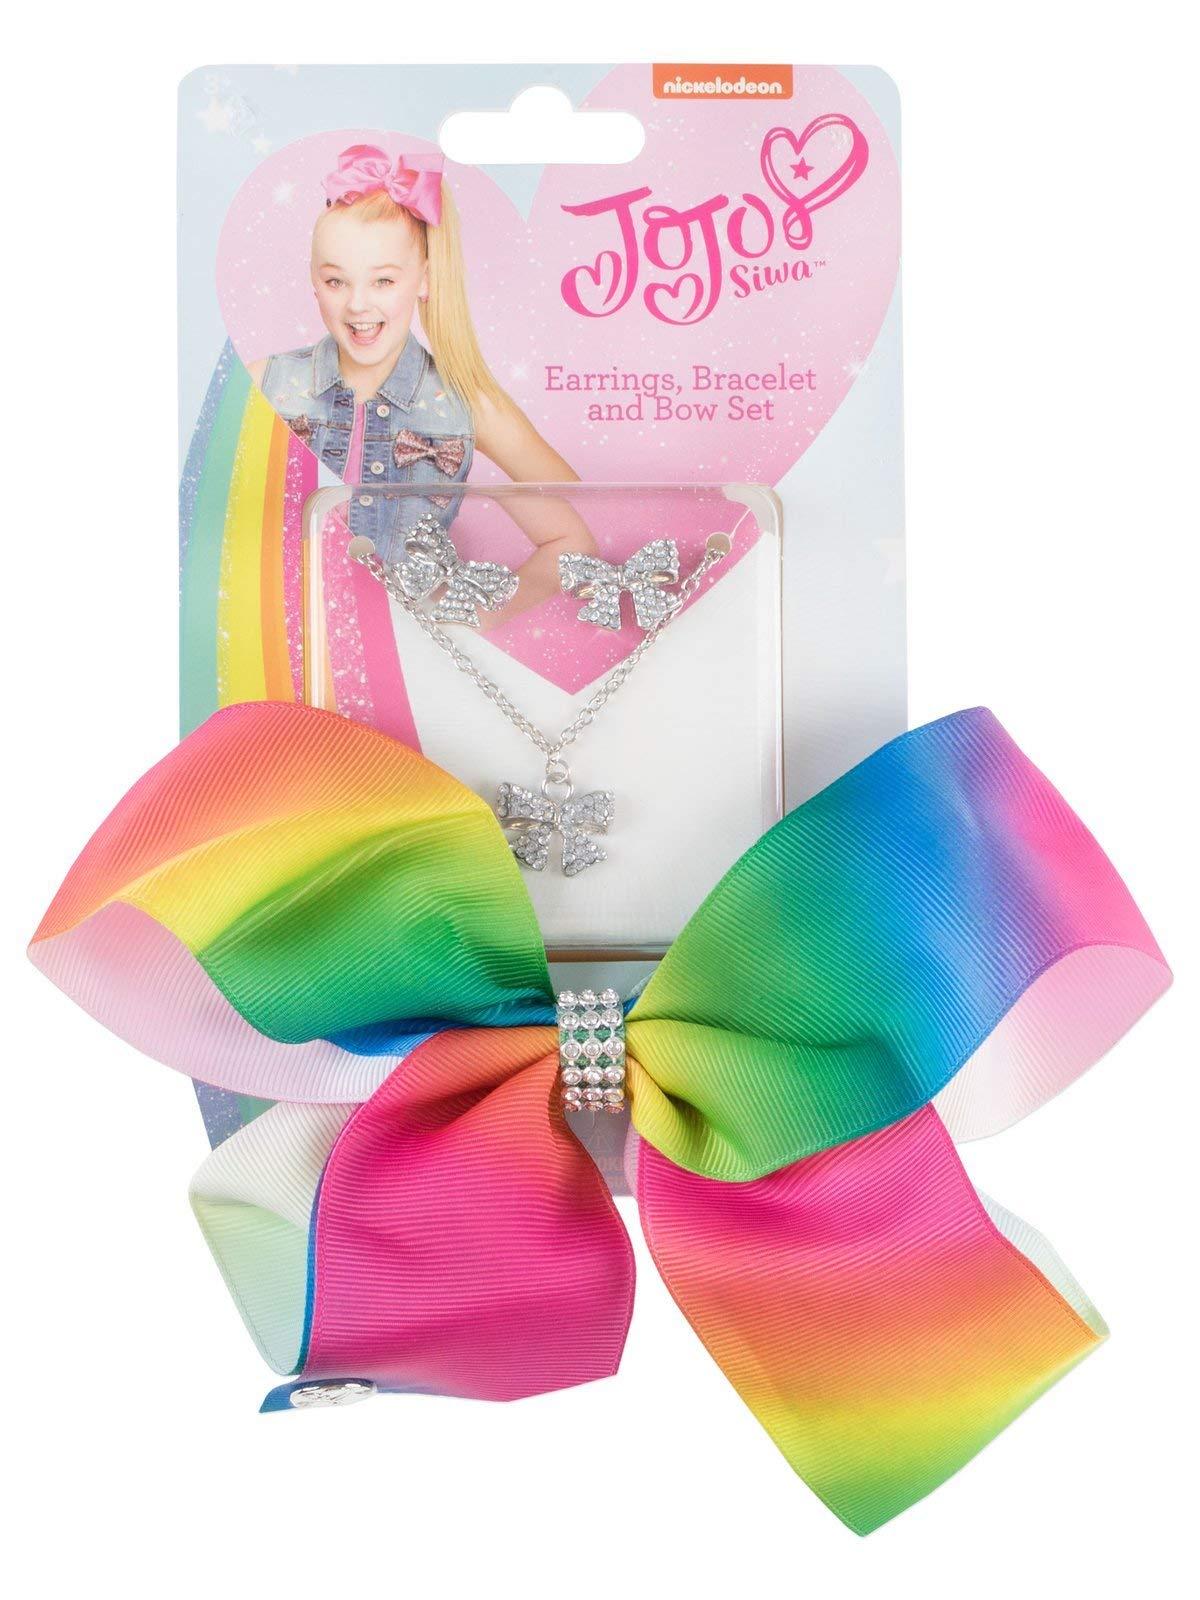 Nickelodeon JoJo Siwa Dreaming of Unicorns Purse W/Removable Plush Unicorn & JoJo Rainbow Hair Bow - Multi Value Bundle by By JoJo Siwa (Image #4)